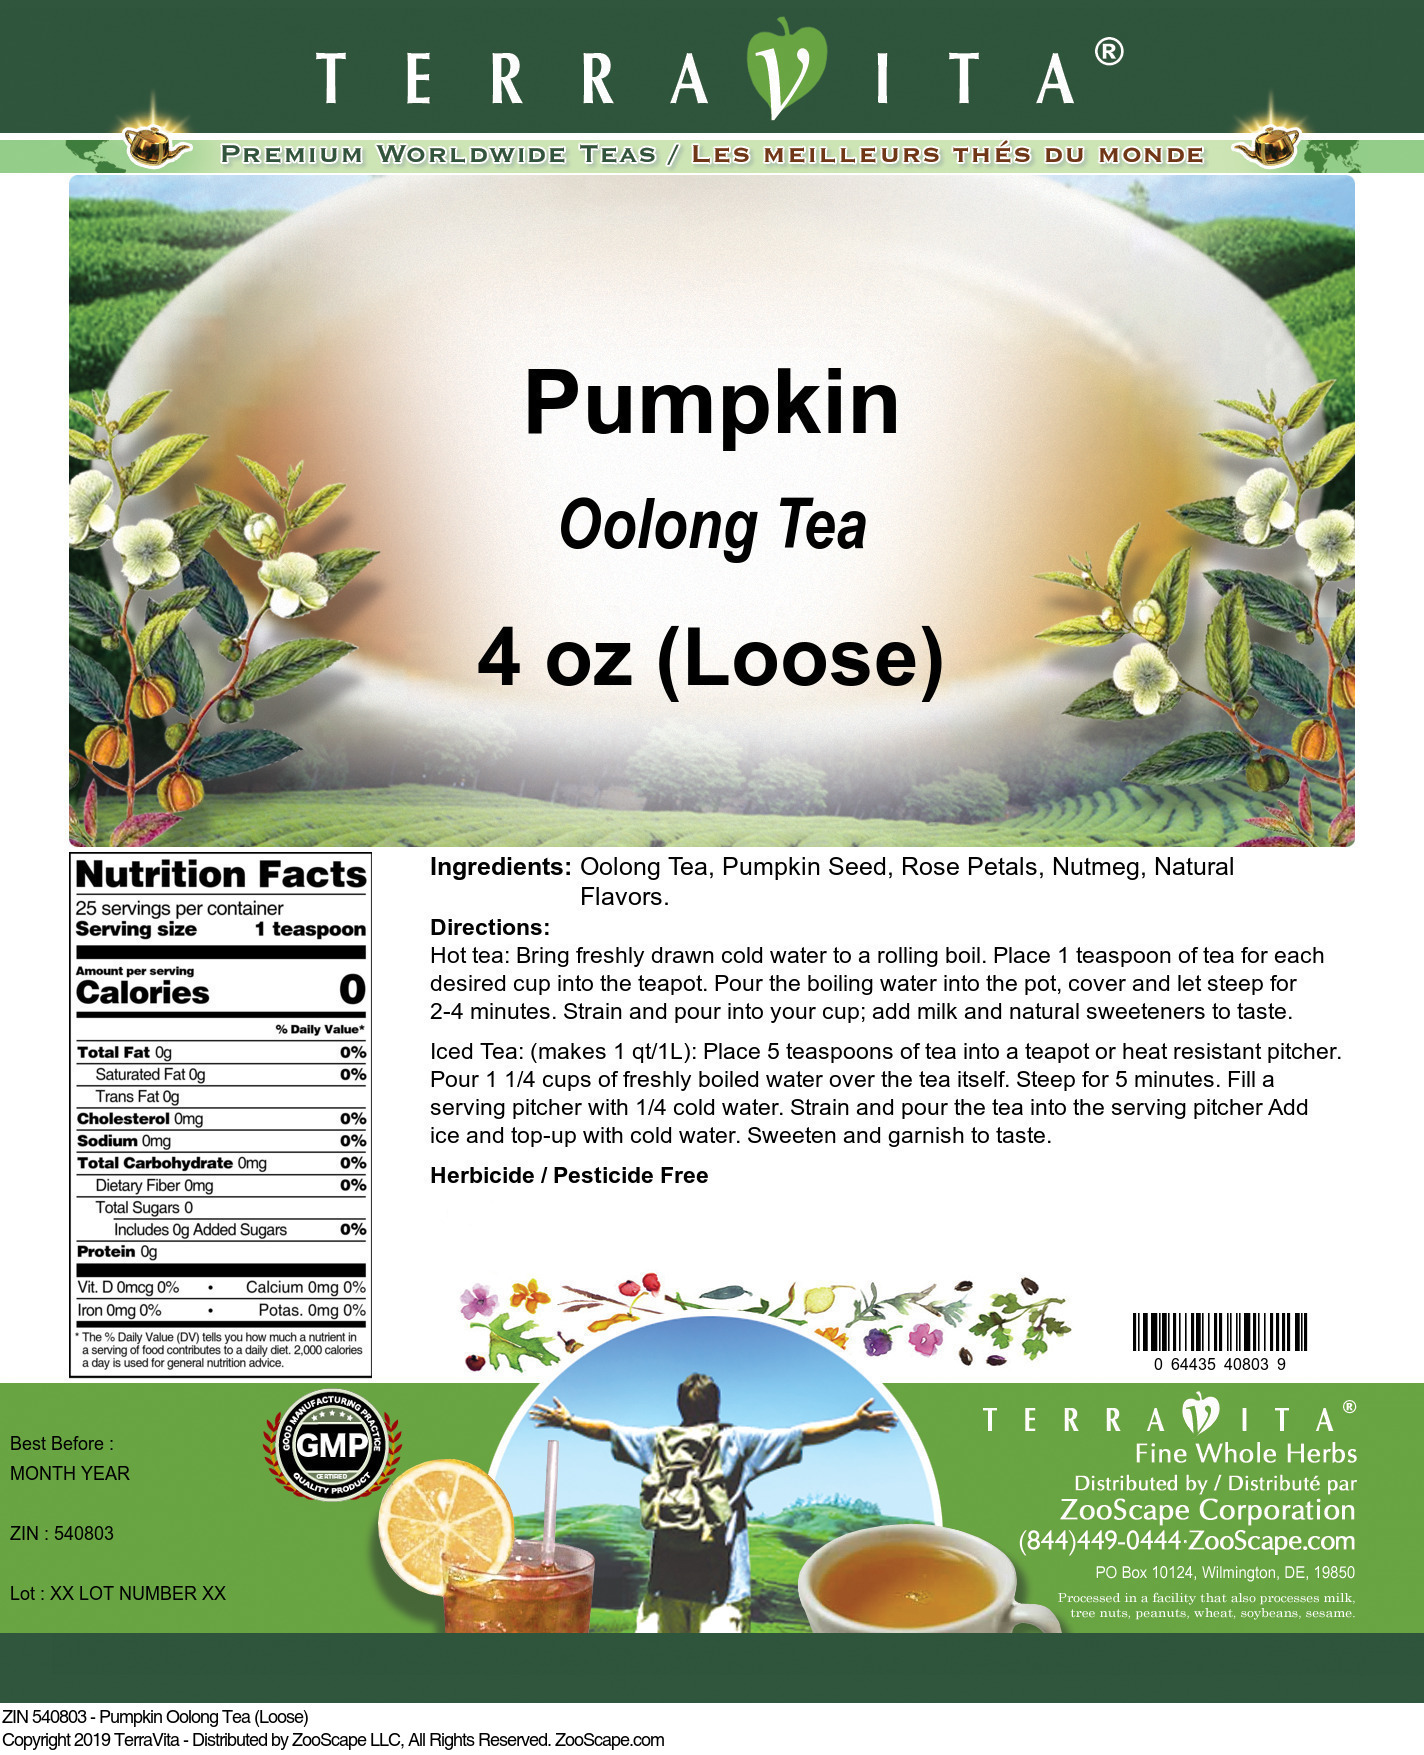 Pumpkin Oolong Tea